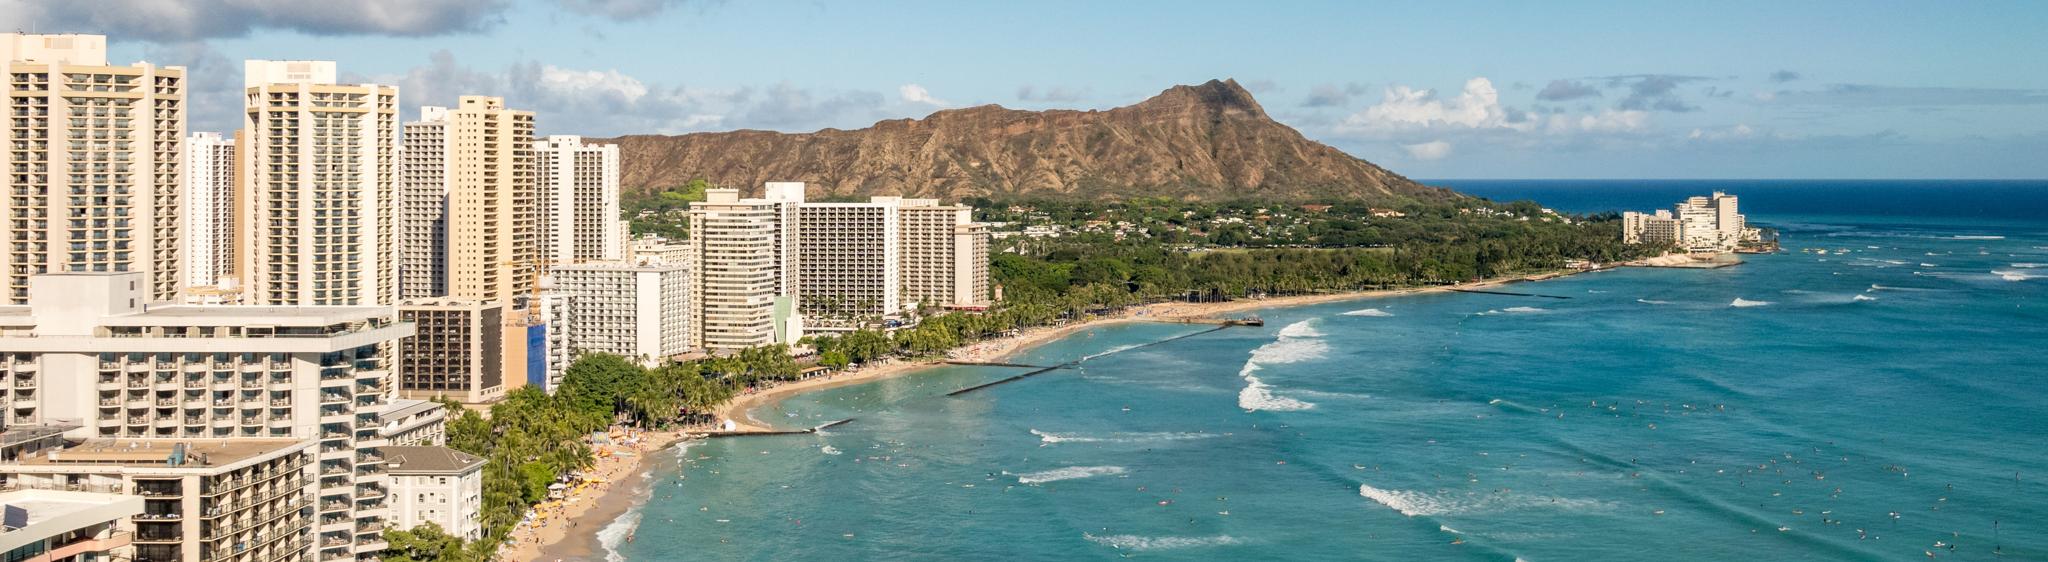 Pedal Bar Honolulu - Best Bachelorette Party Pedal Pub Crawl in Honolulu, Hawaii